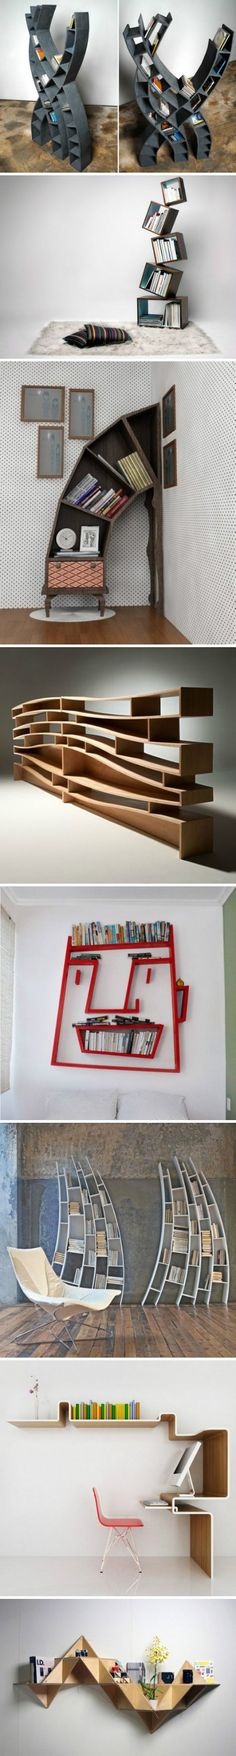 books, alice in wonderland, kid rooms, bookcas, hous, front room, display shelves, tim burton, design